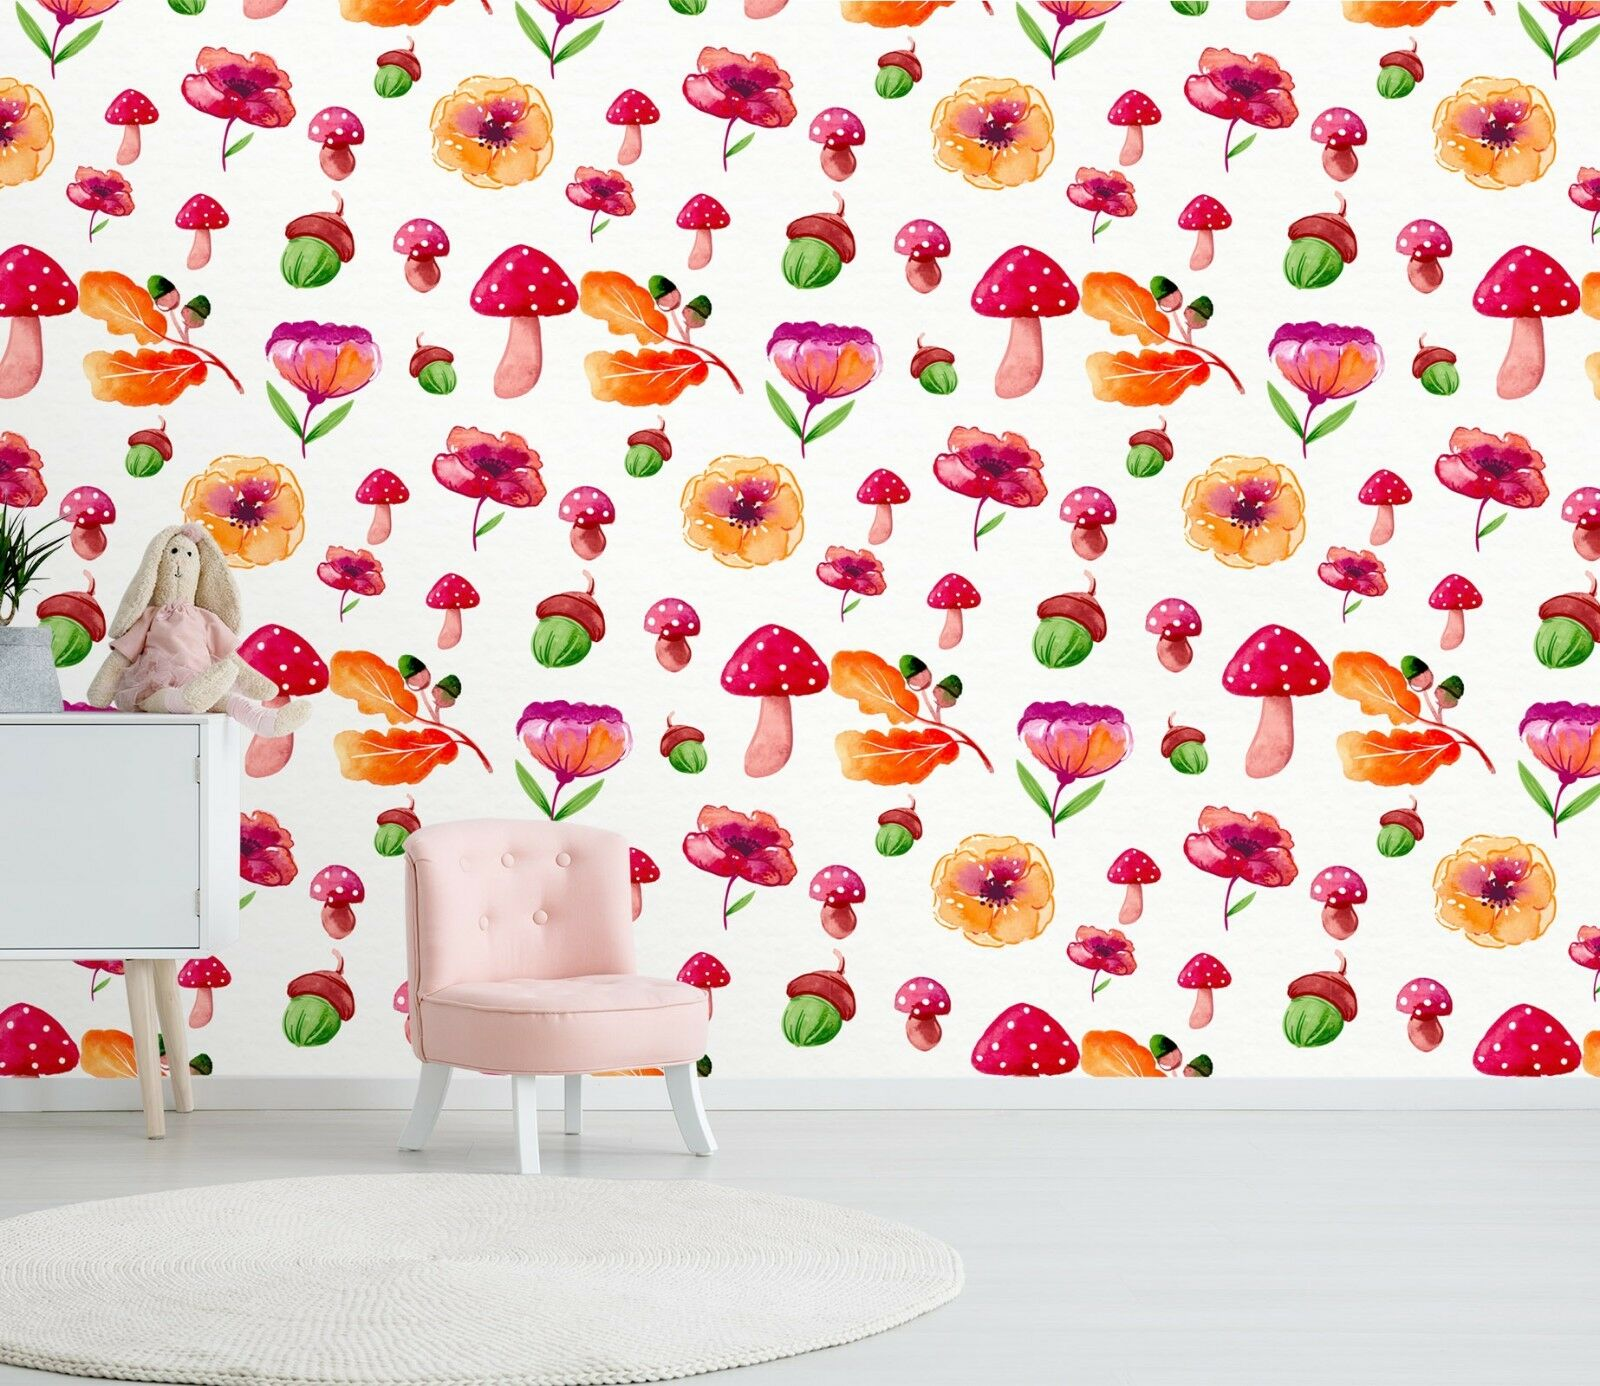 3D Aquarell Pilz Blume 22 Tapete Wandgemälde Tapete Tapeten Familie Kinde DE